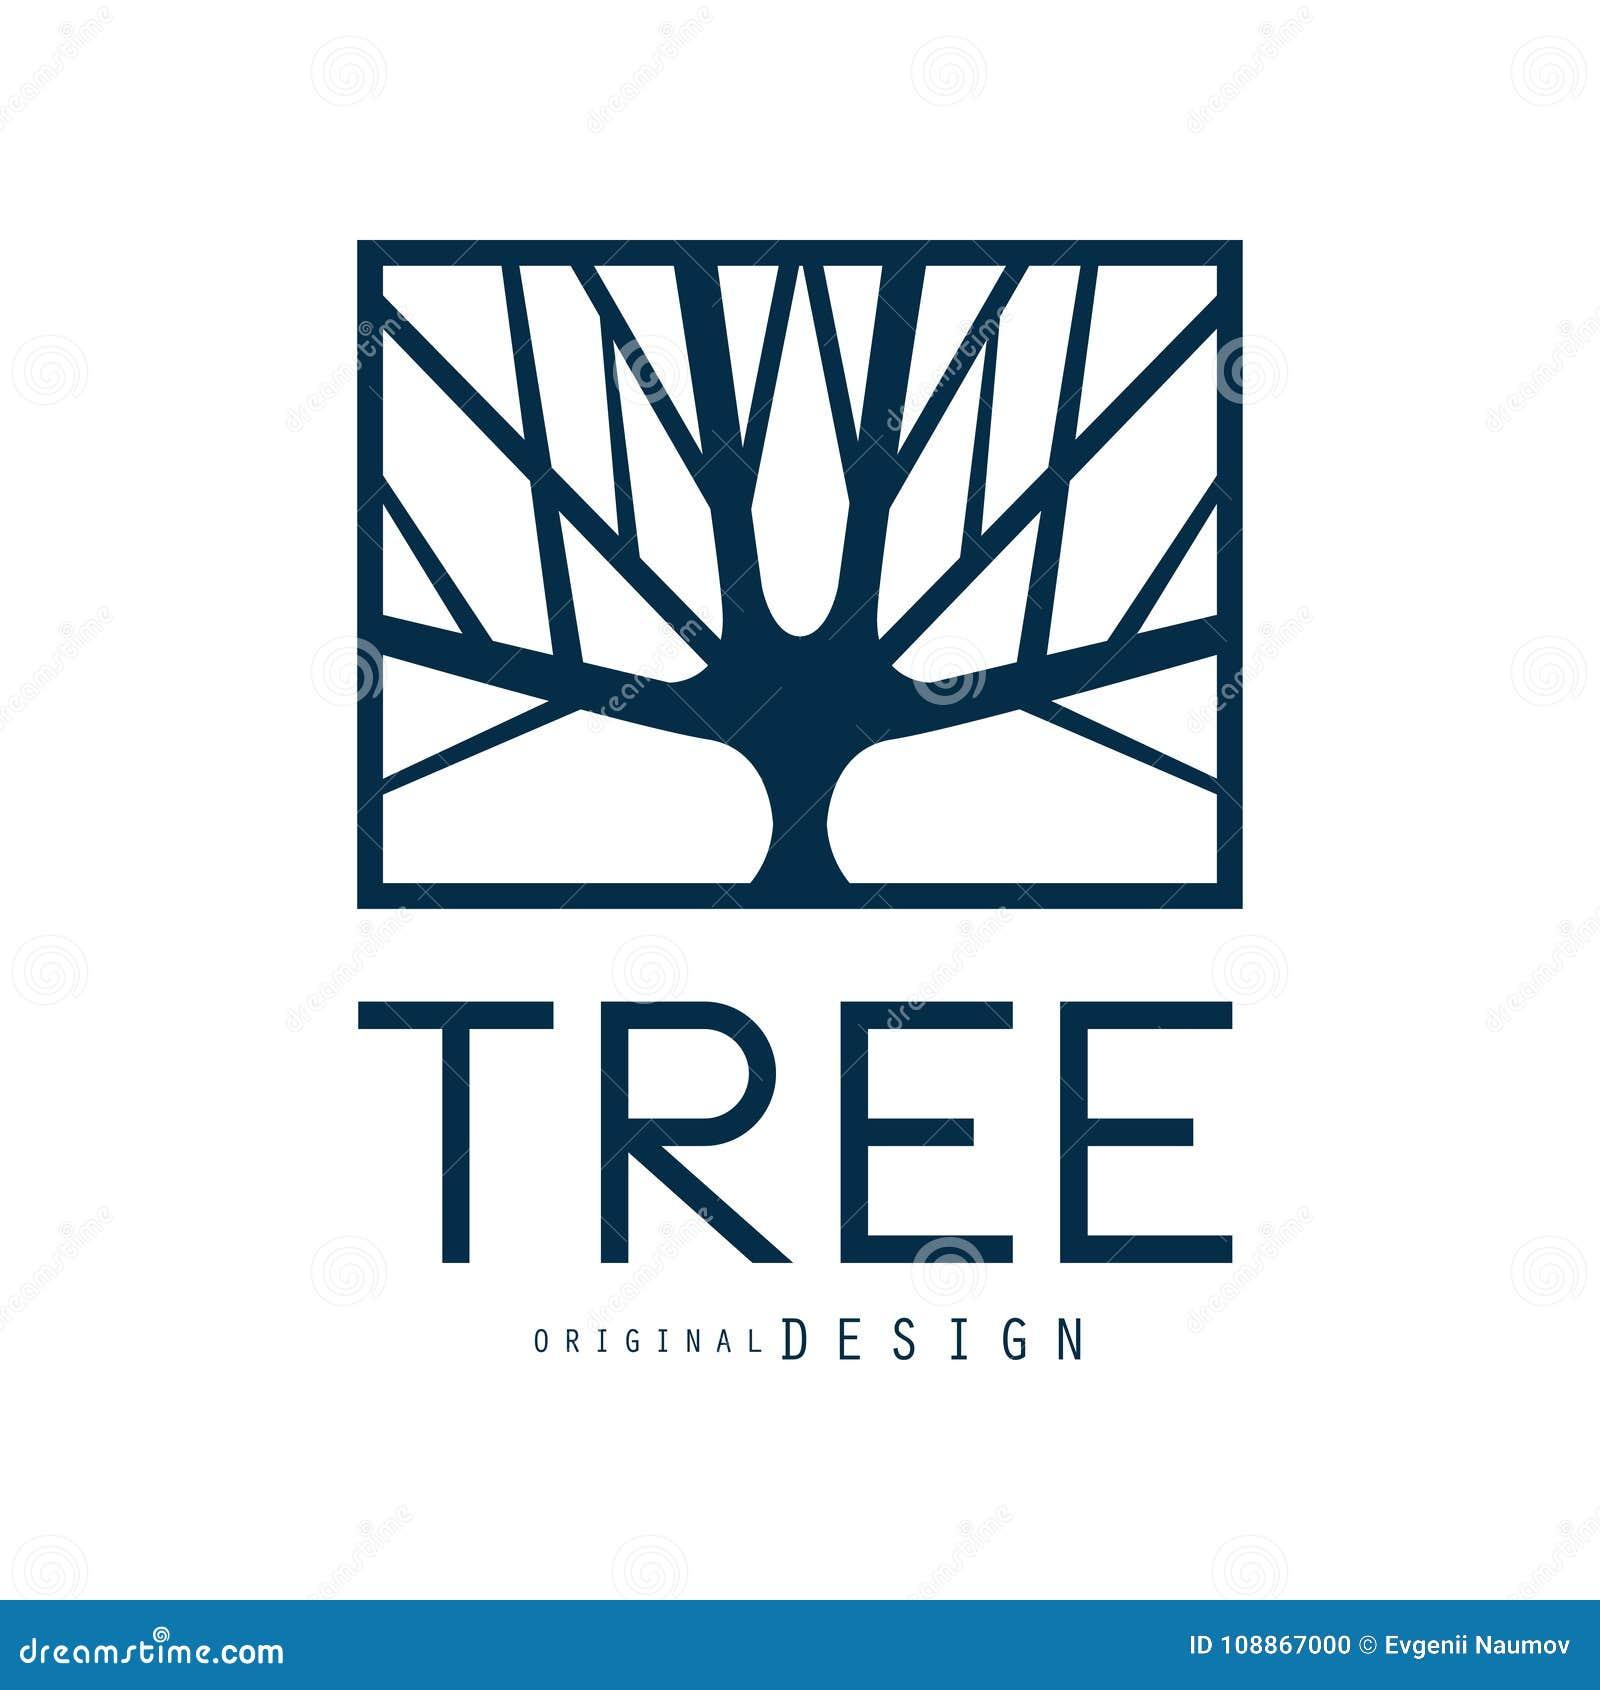 Tree logo template original design, blue eco badge, abstract organic element vector illustration